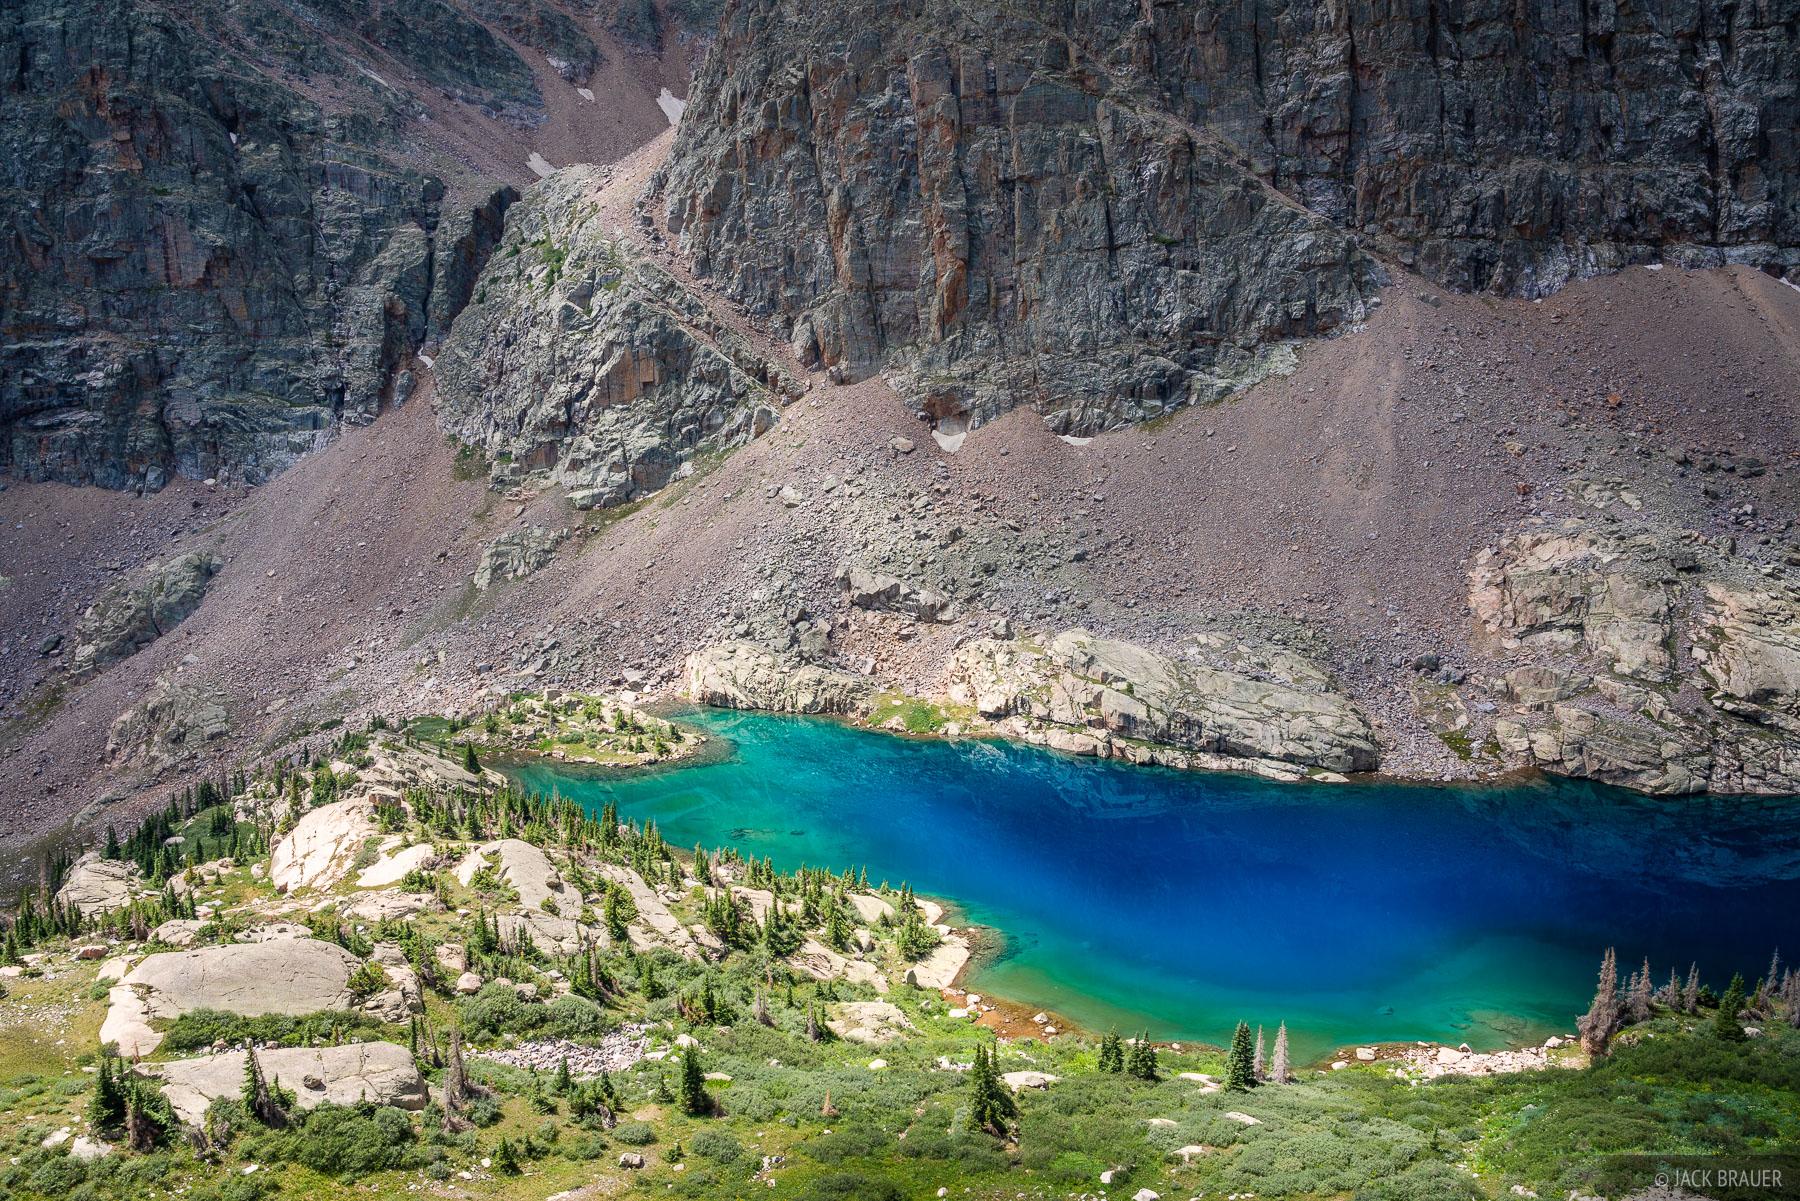 Brilliant aqua blue colors in a very remote alpine lake in the Weminuche Wilderness.